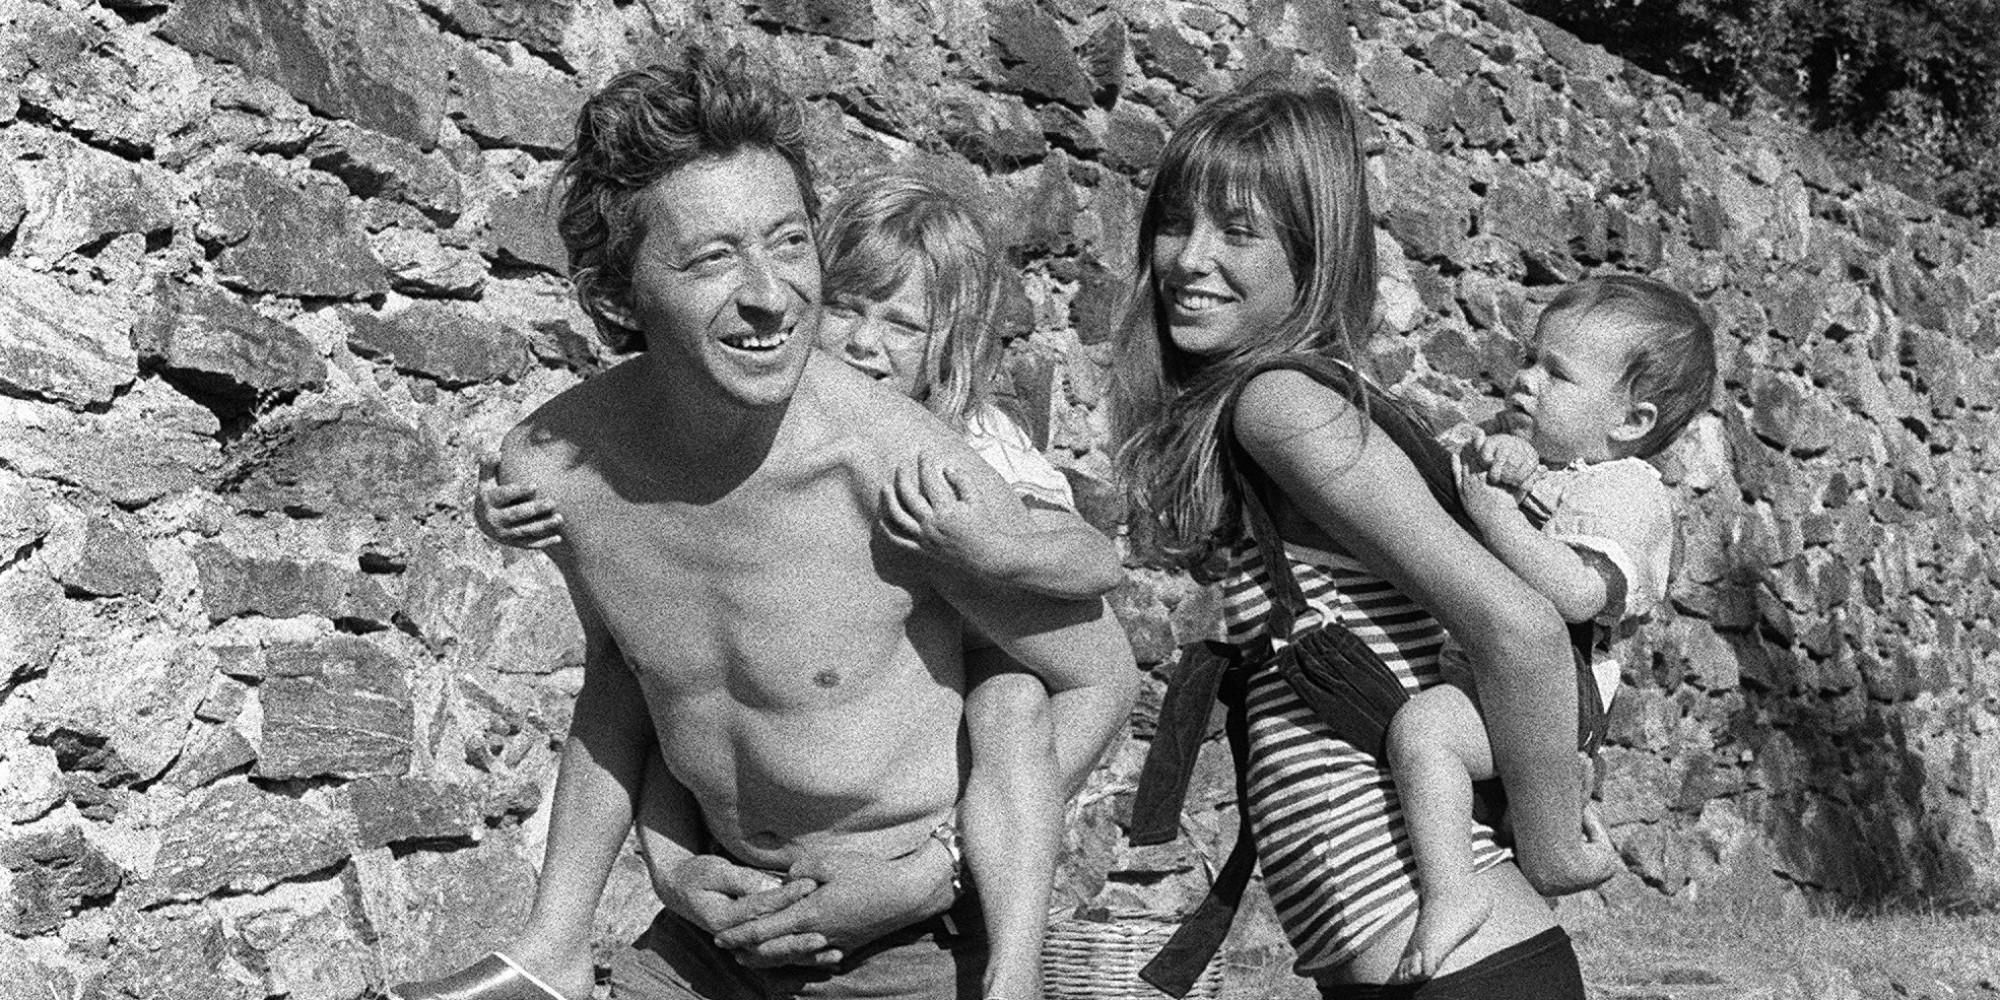 Brigitte Bardot Et Serge Gainsbourg Bonnie And Clyde